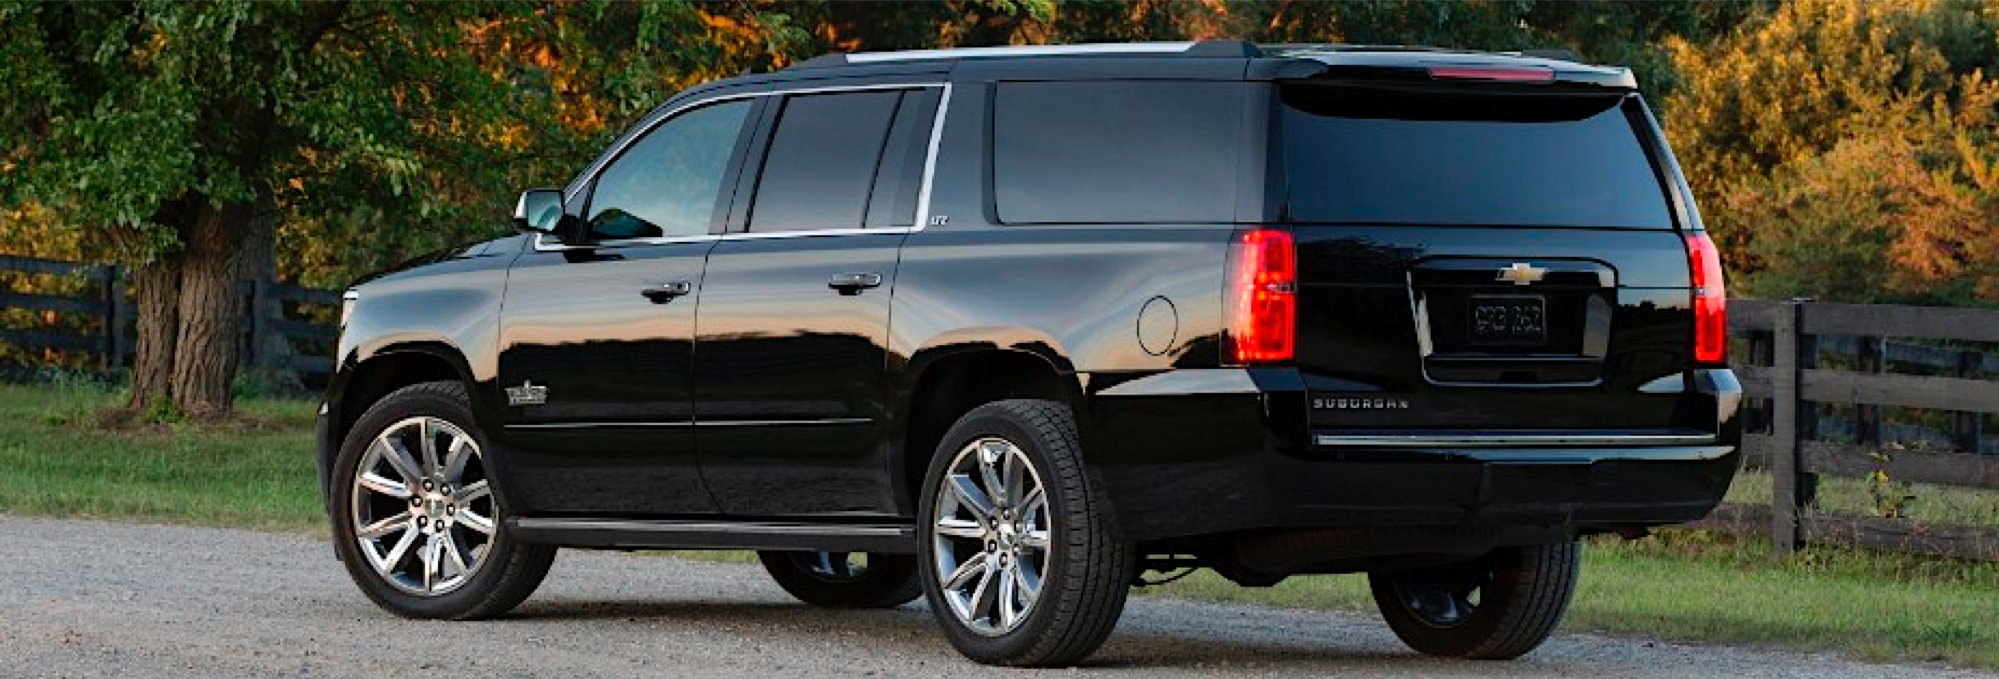 The 2020 Chevrolet Suburban